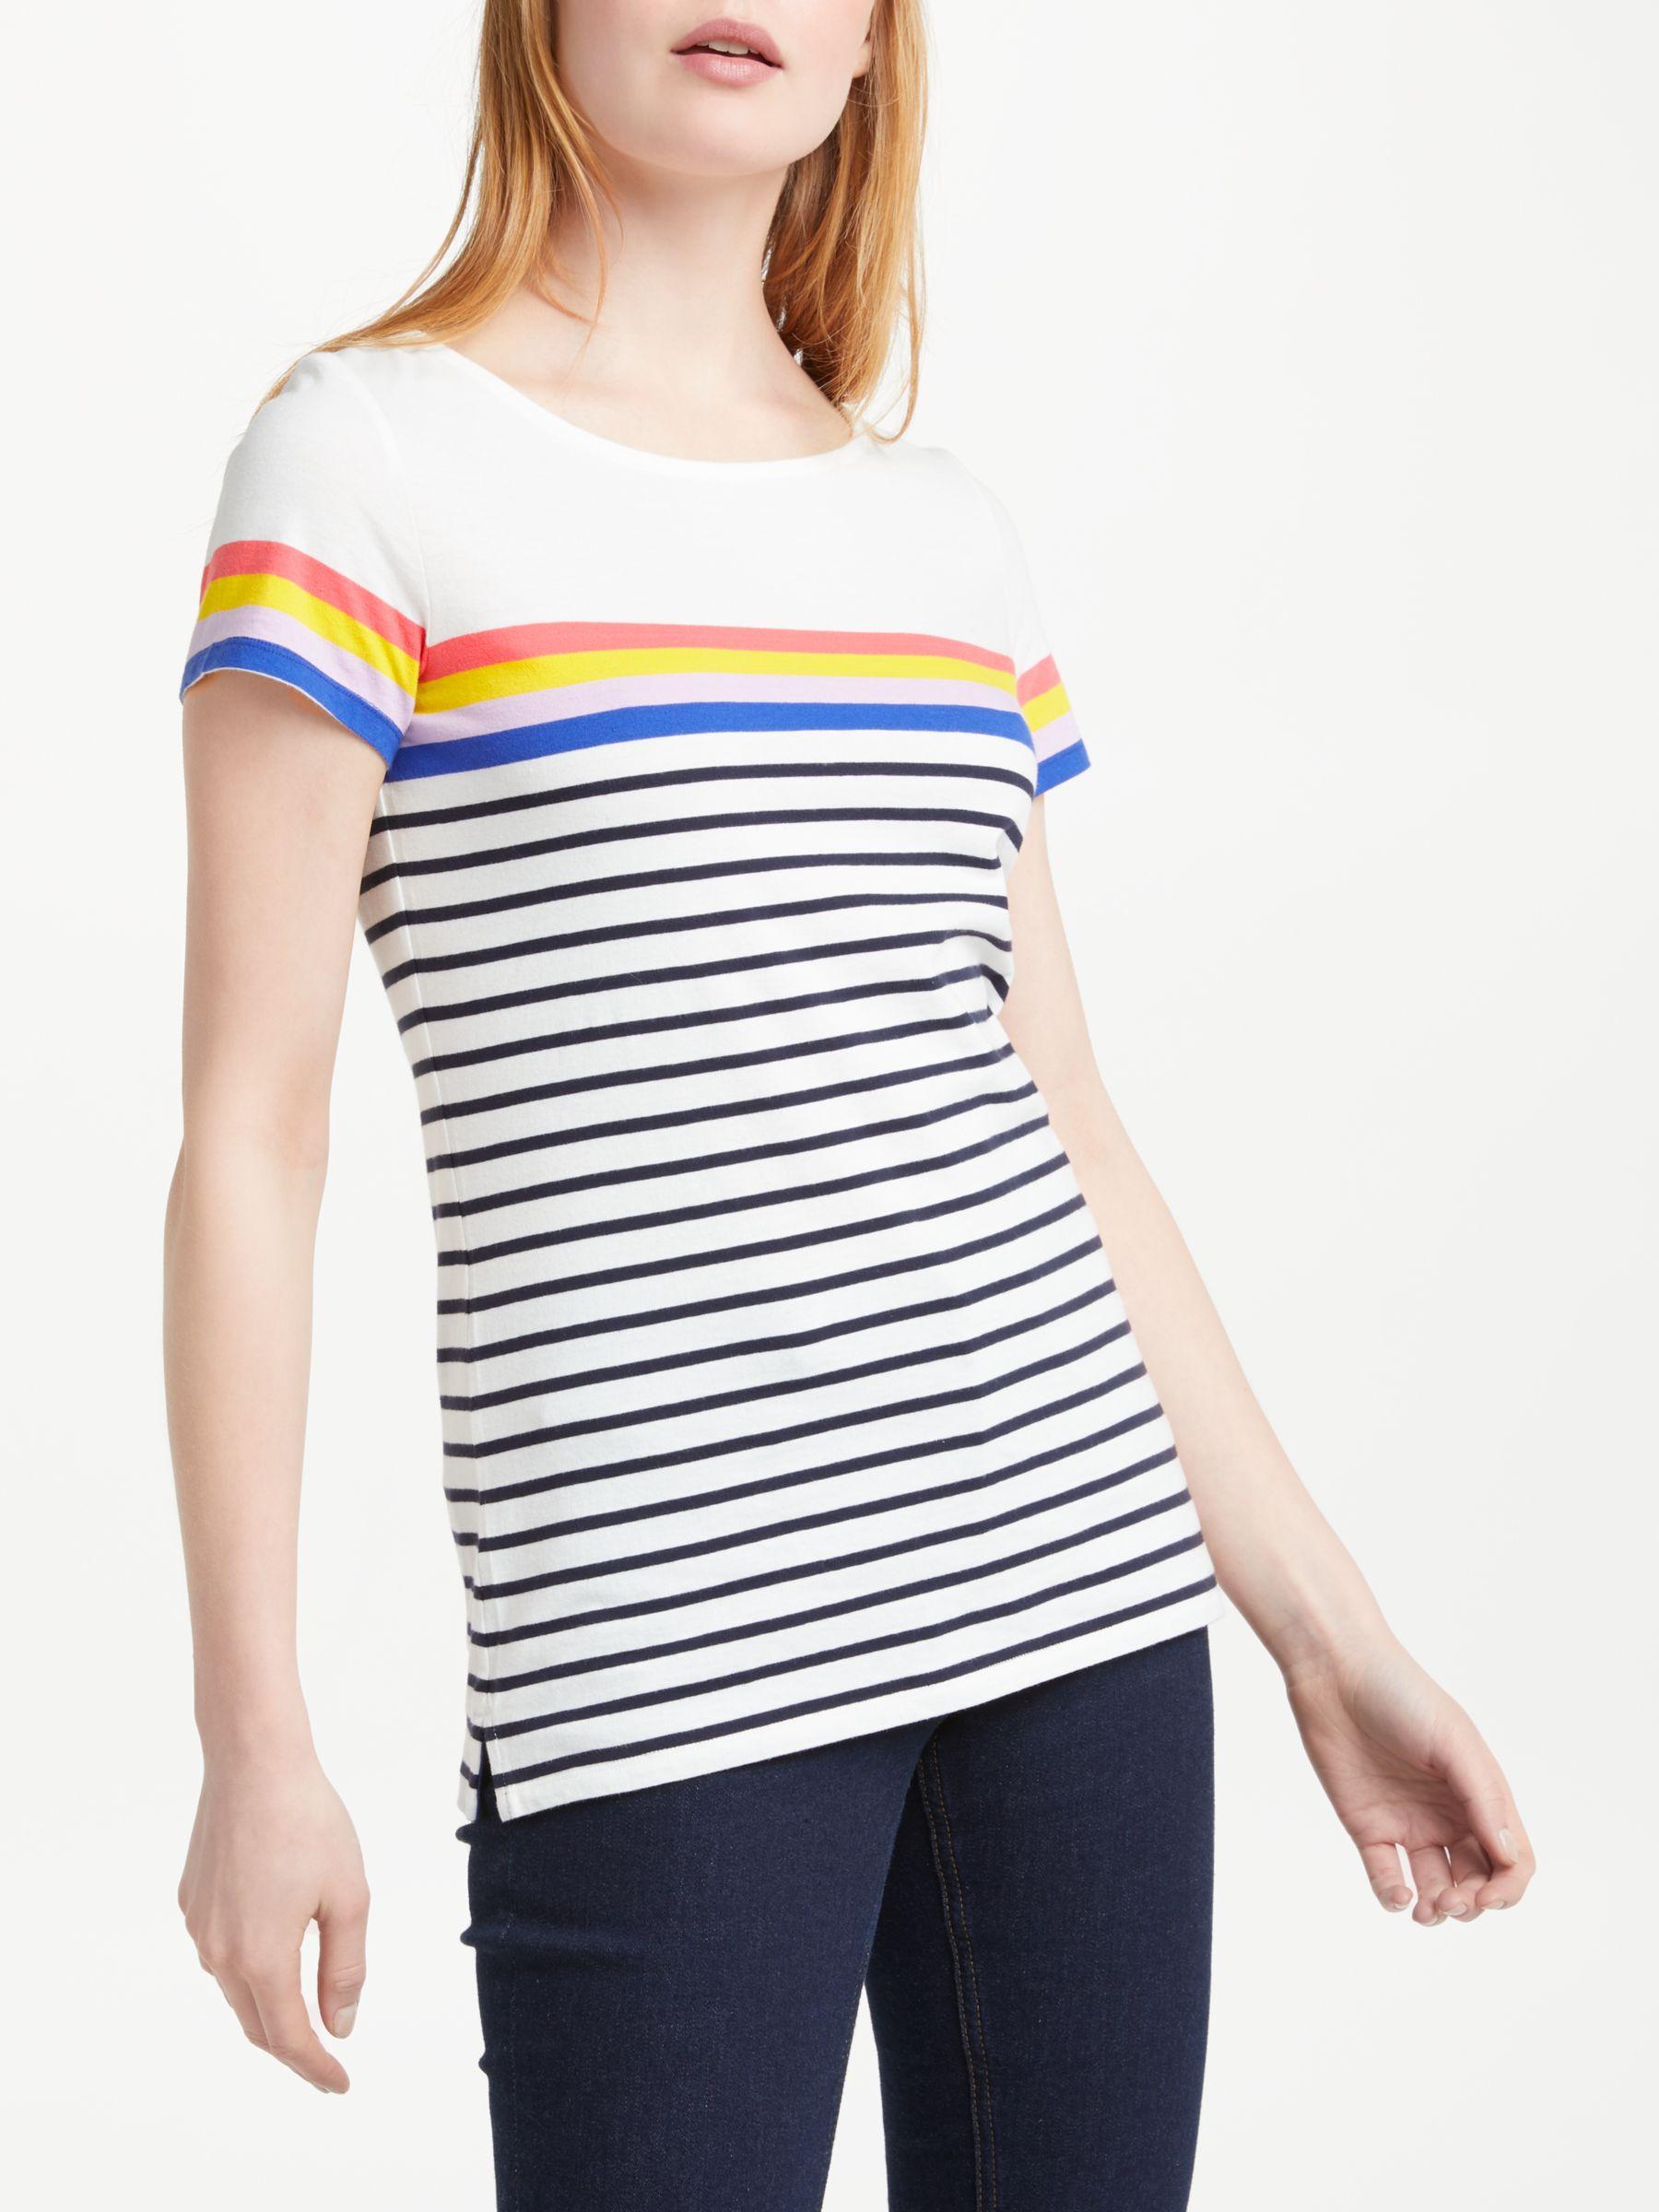 bc233610 Boden Short Sleeve Breton T-Shirt, Ivory/Multi at John Lewis & Partners